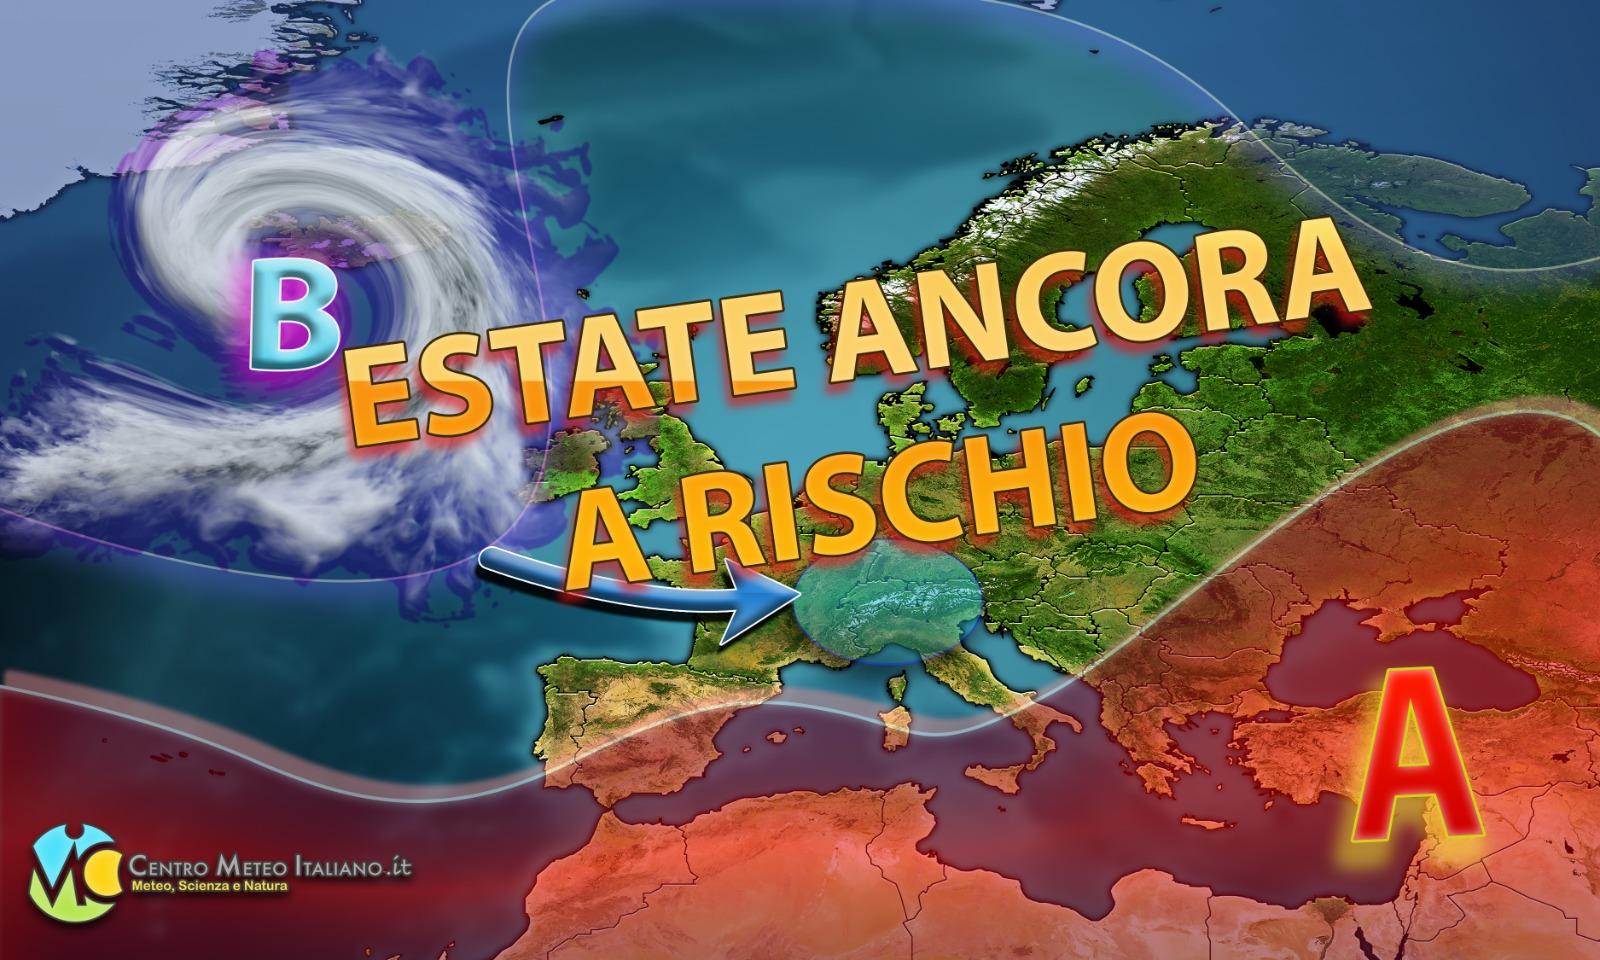 Tendenza meteo: torna l'anticiclone ma l'estate sarà ancora a rischio